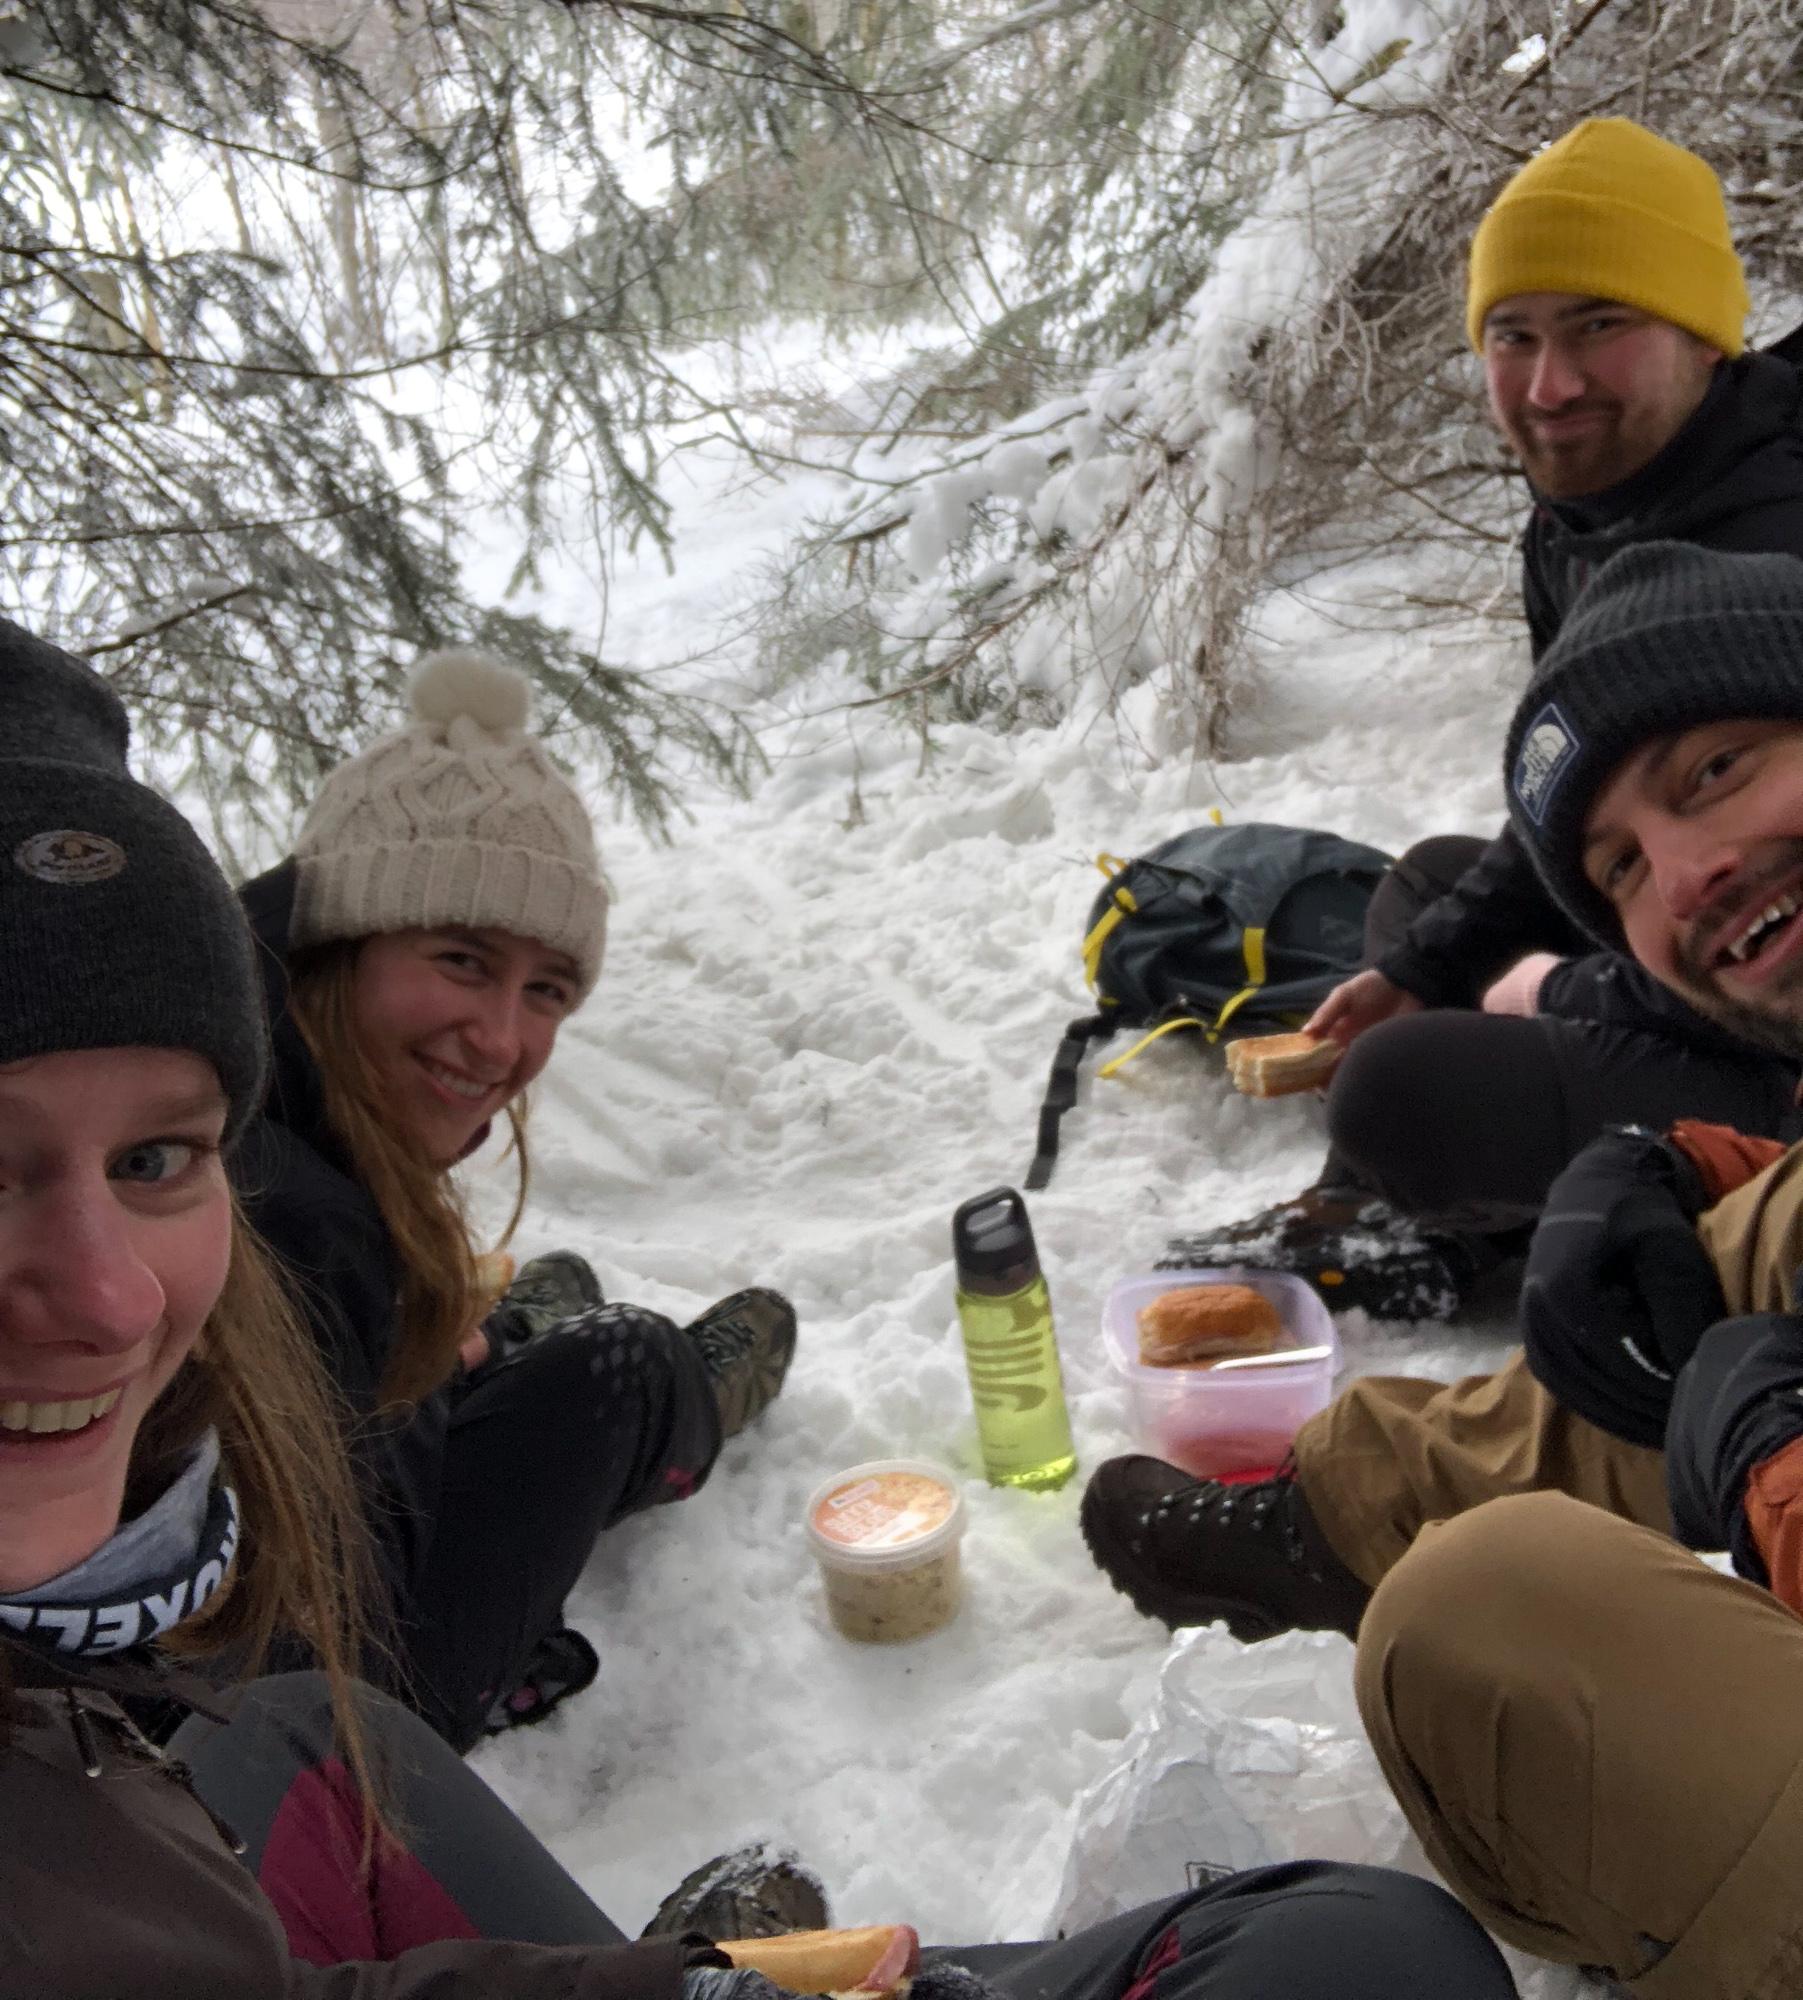 4 vrienden picknicken in de sneeuw